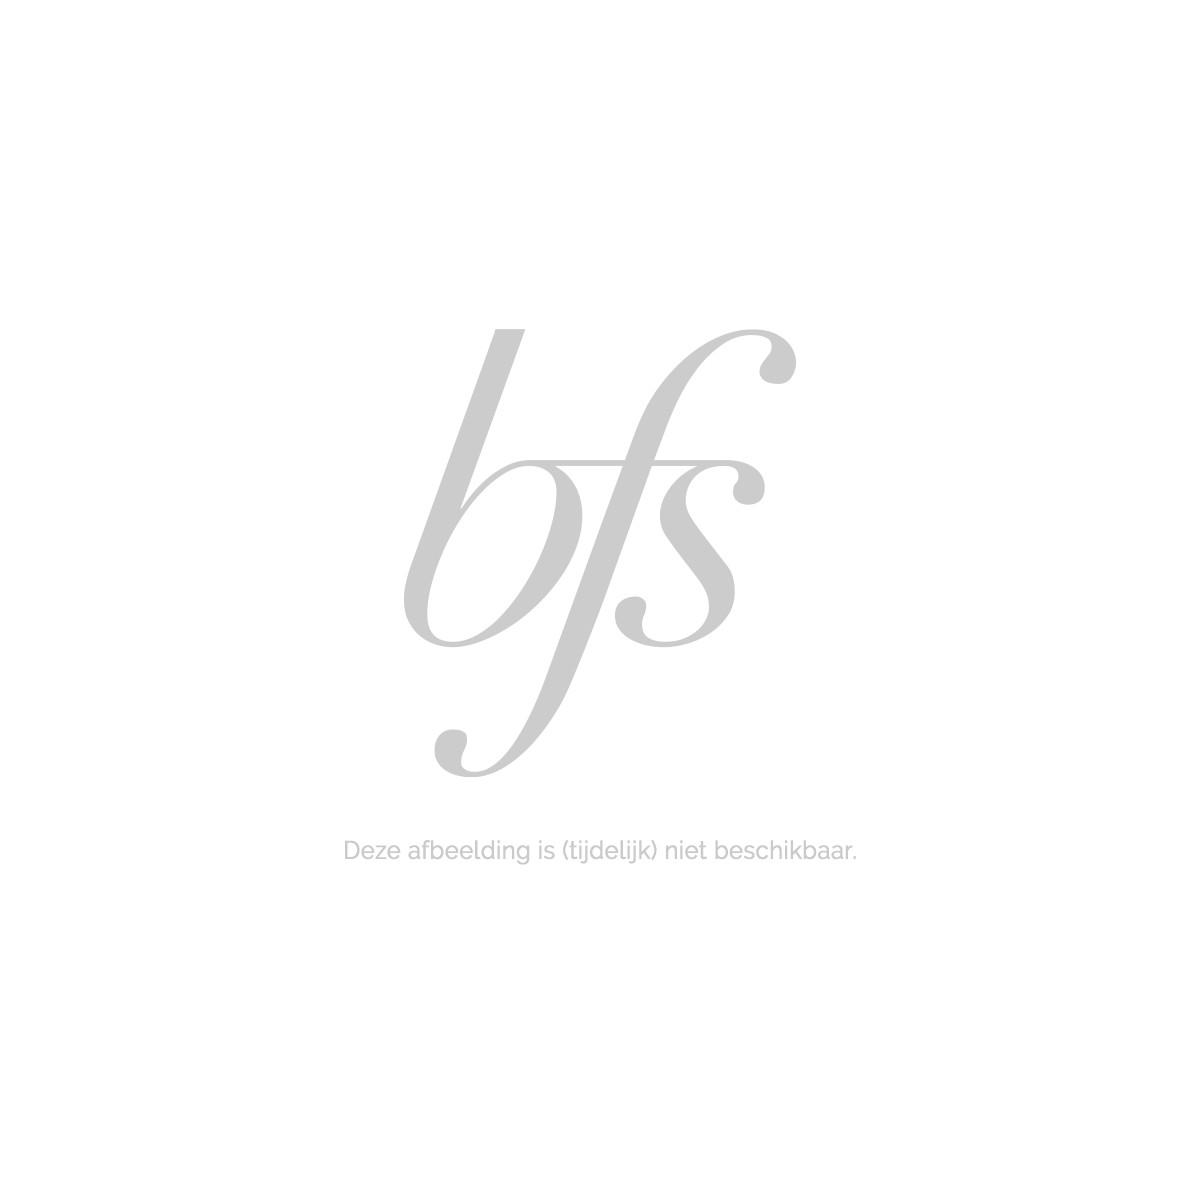 Pupa Smoothing Foundation Primer 01 Transparent